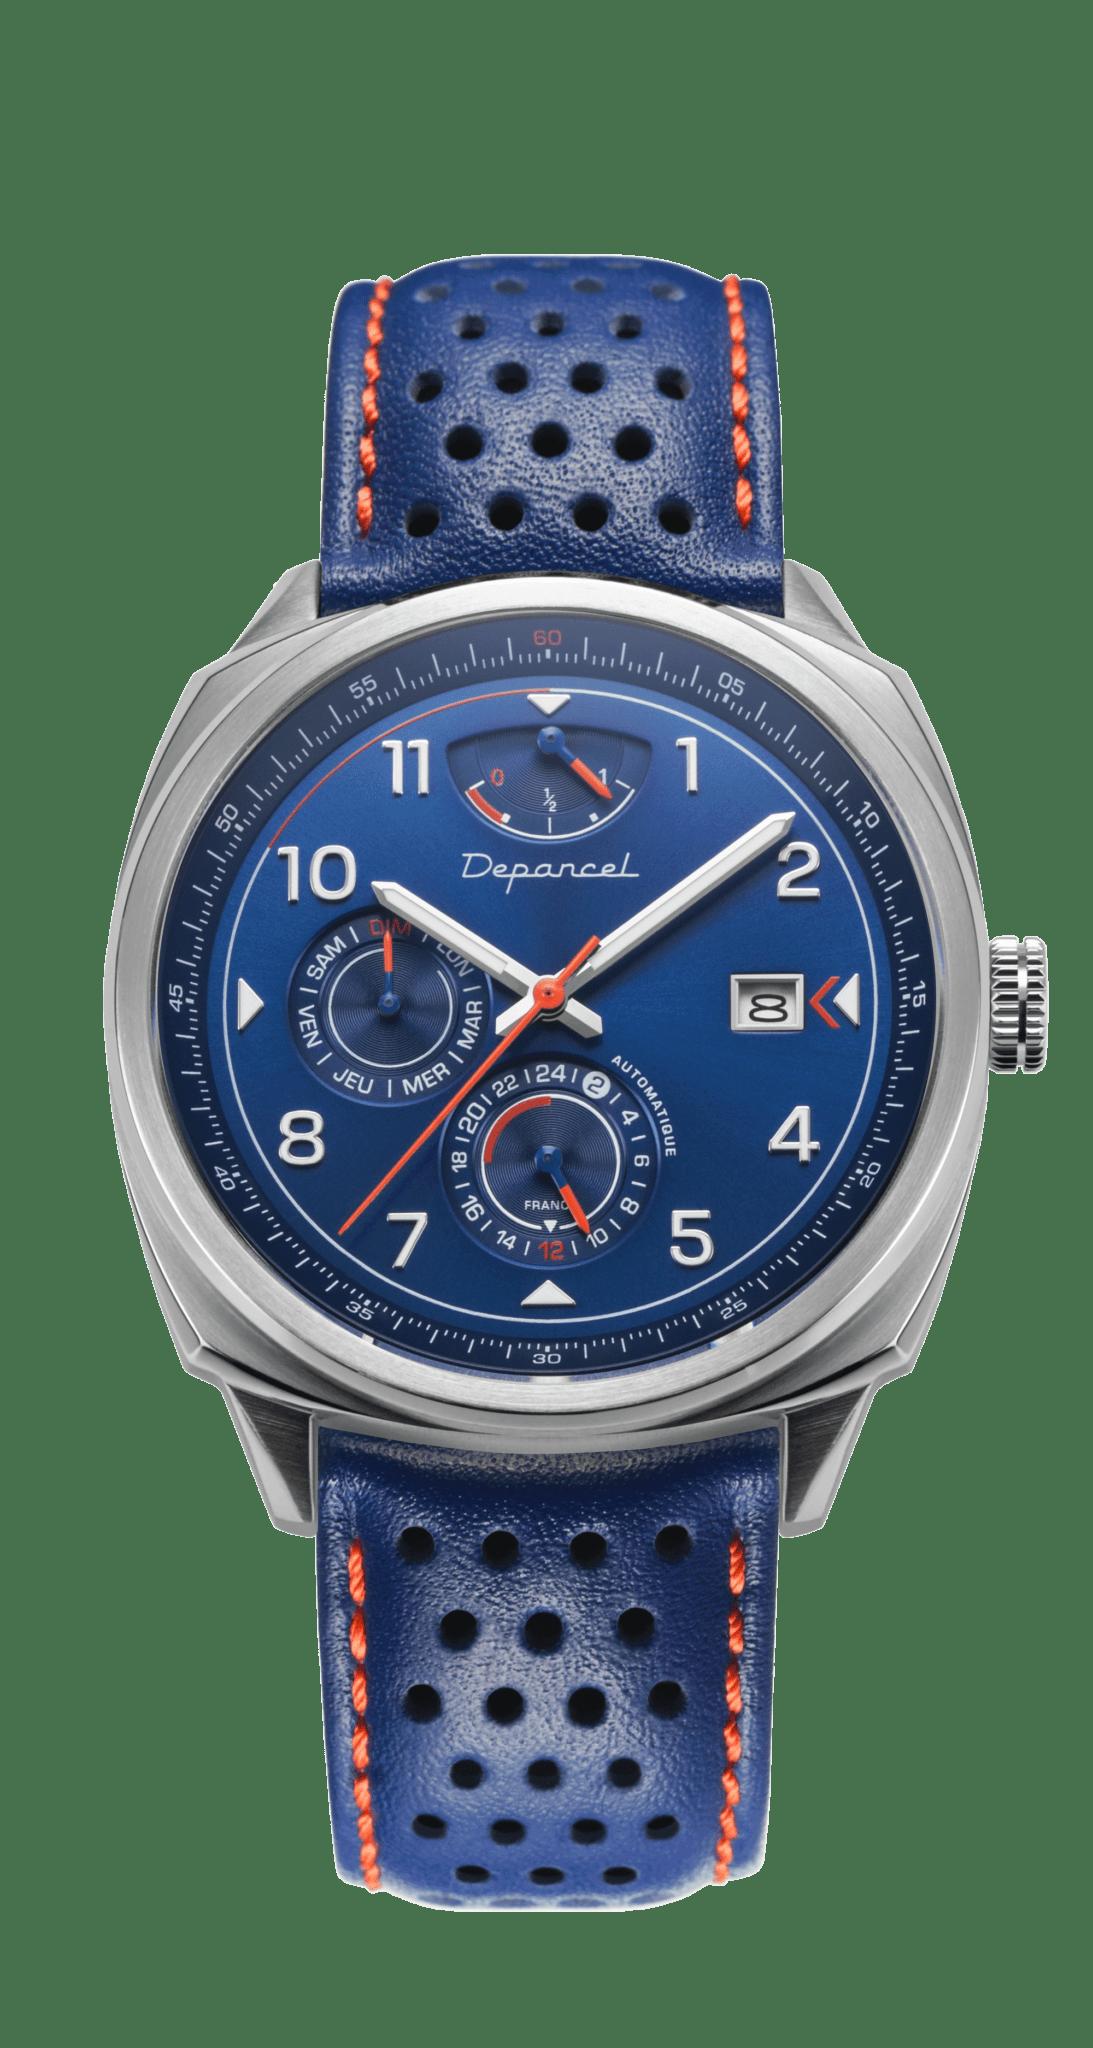 Depancel Auto 110 Bracelet Cuir Bleu Cadran Bleu | Depancel AUTO 110: l'inspiration bleue